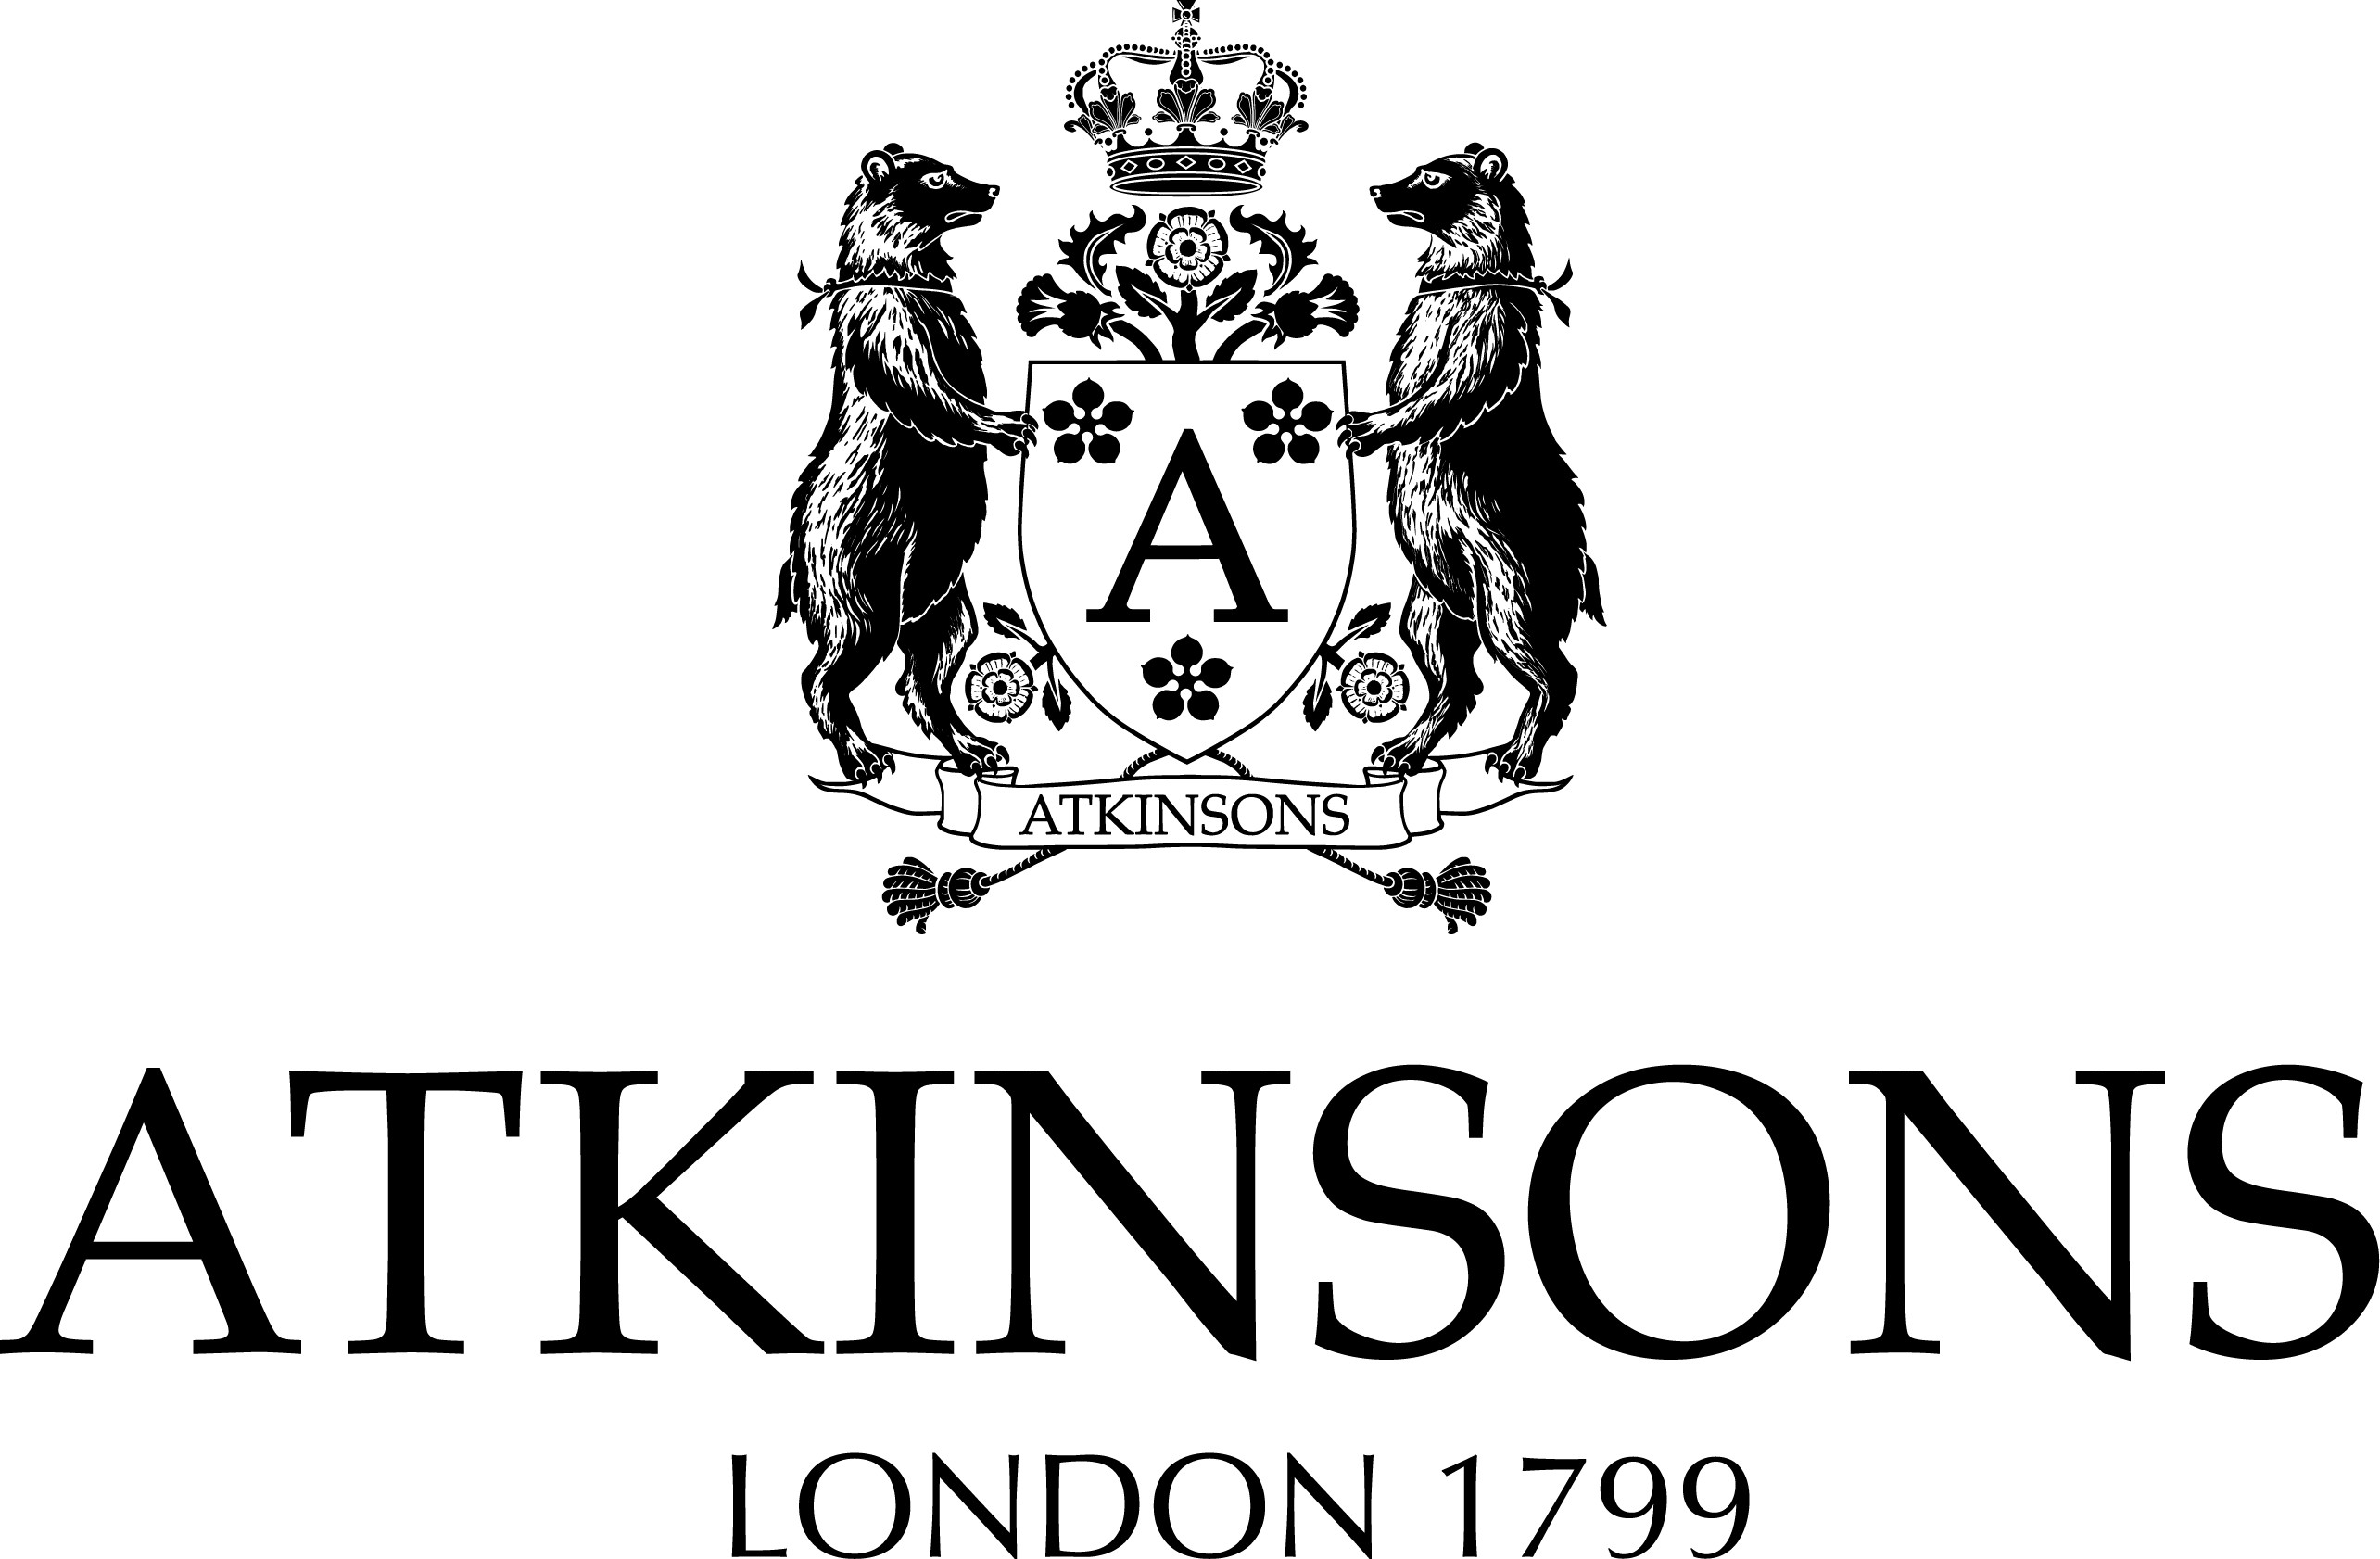 Atkinsons -اتكينسونس